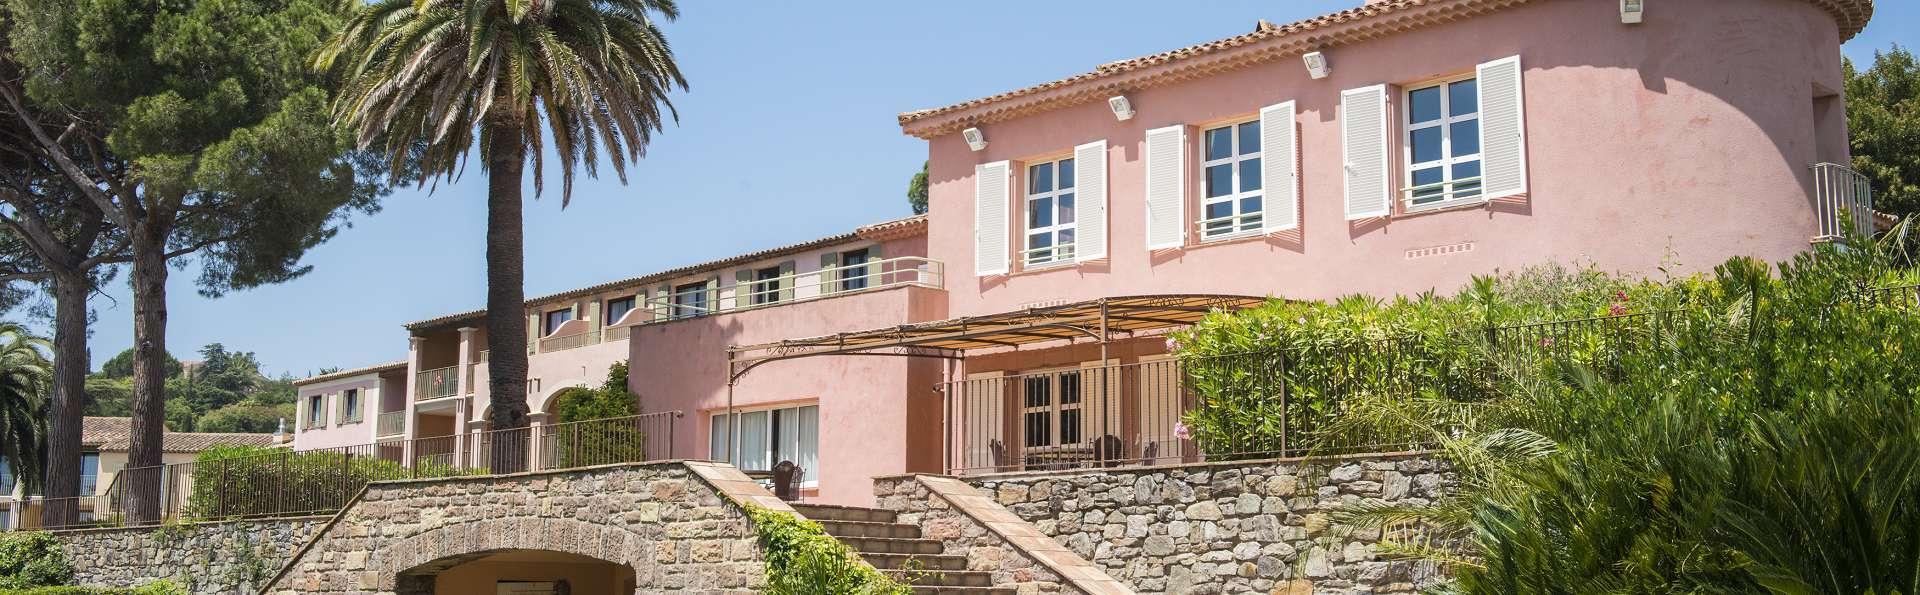 Hôtel Les Jardins de Sainte-Maxime - EDIT_NEW_FRONT.jpg